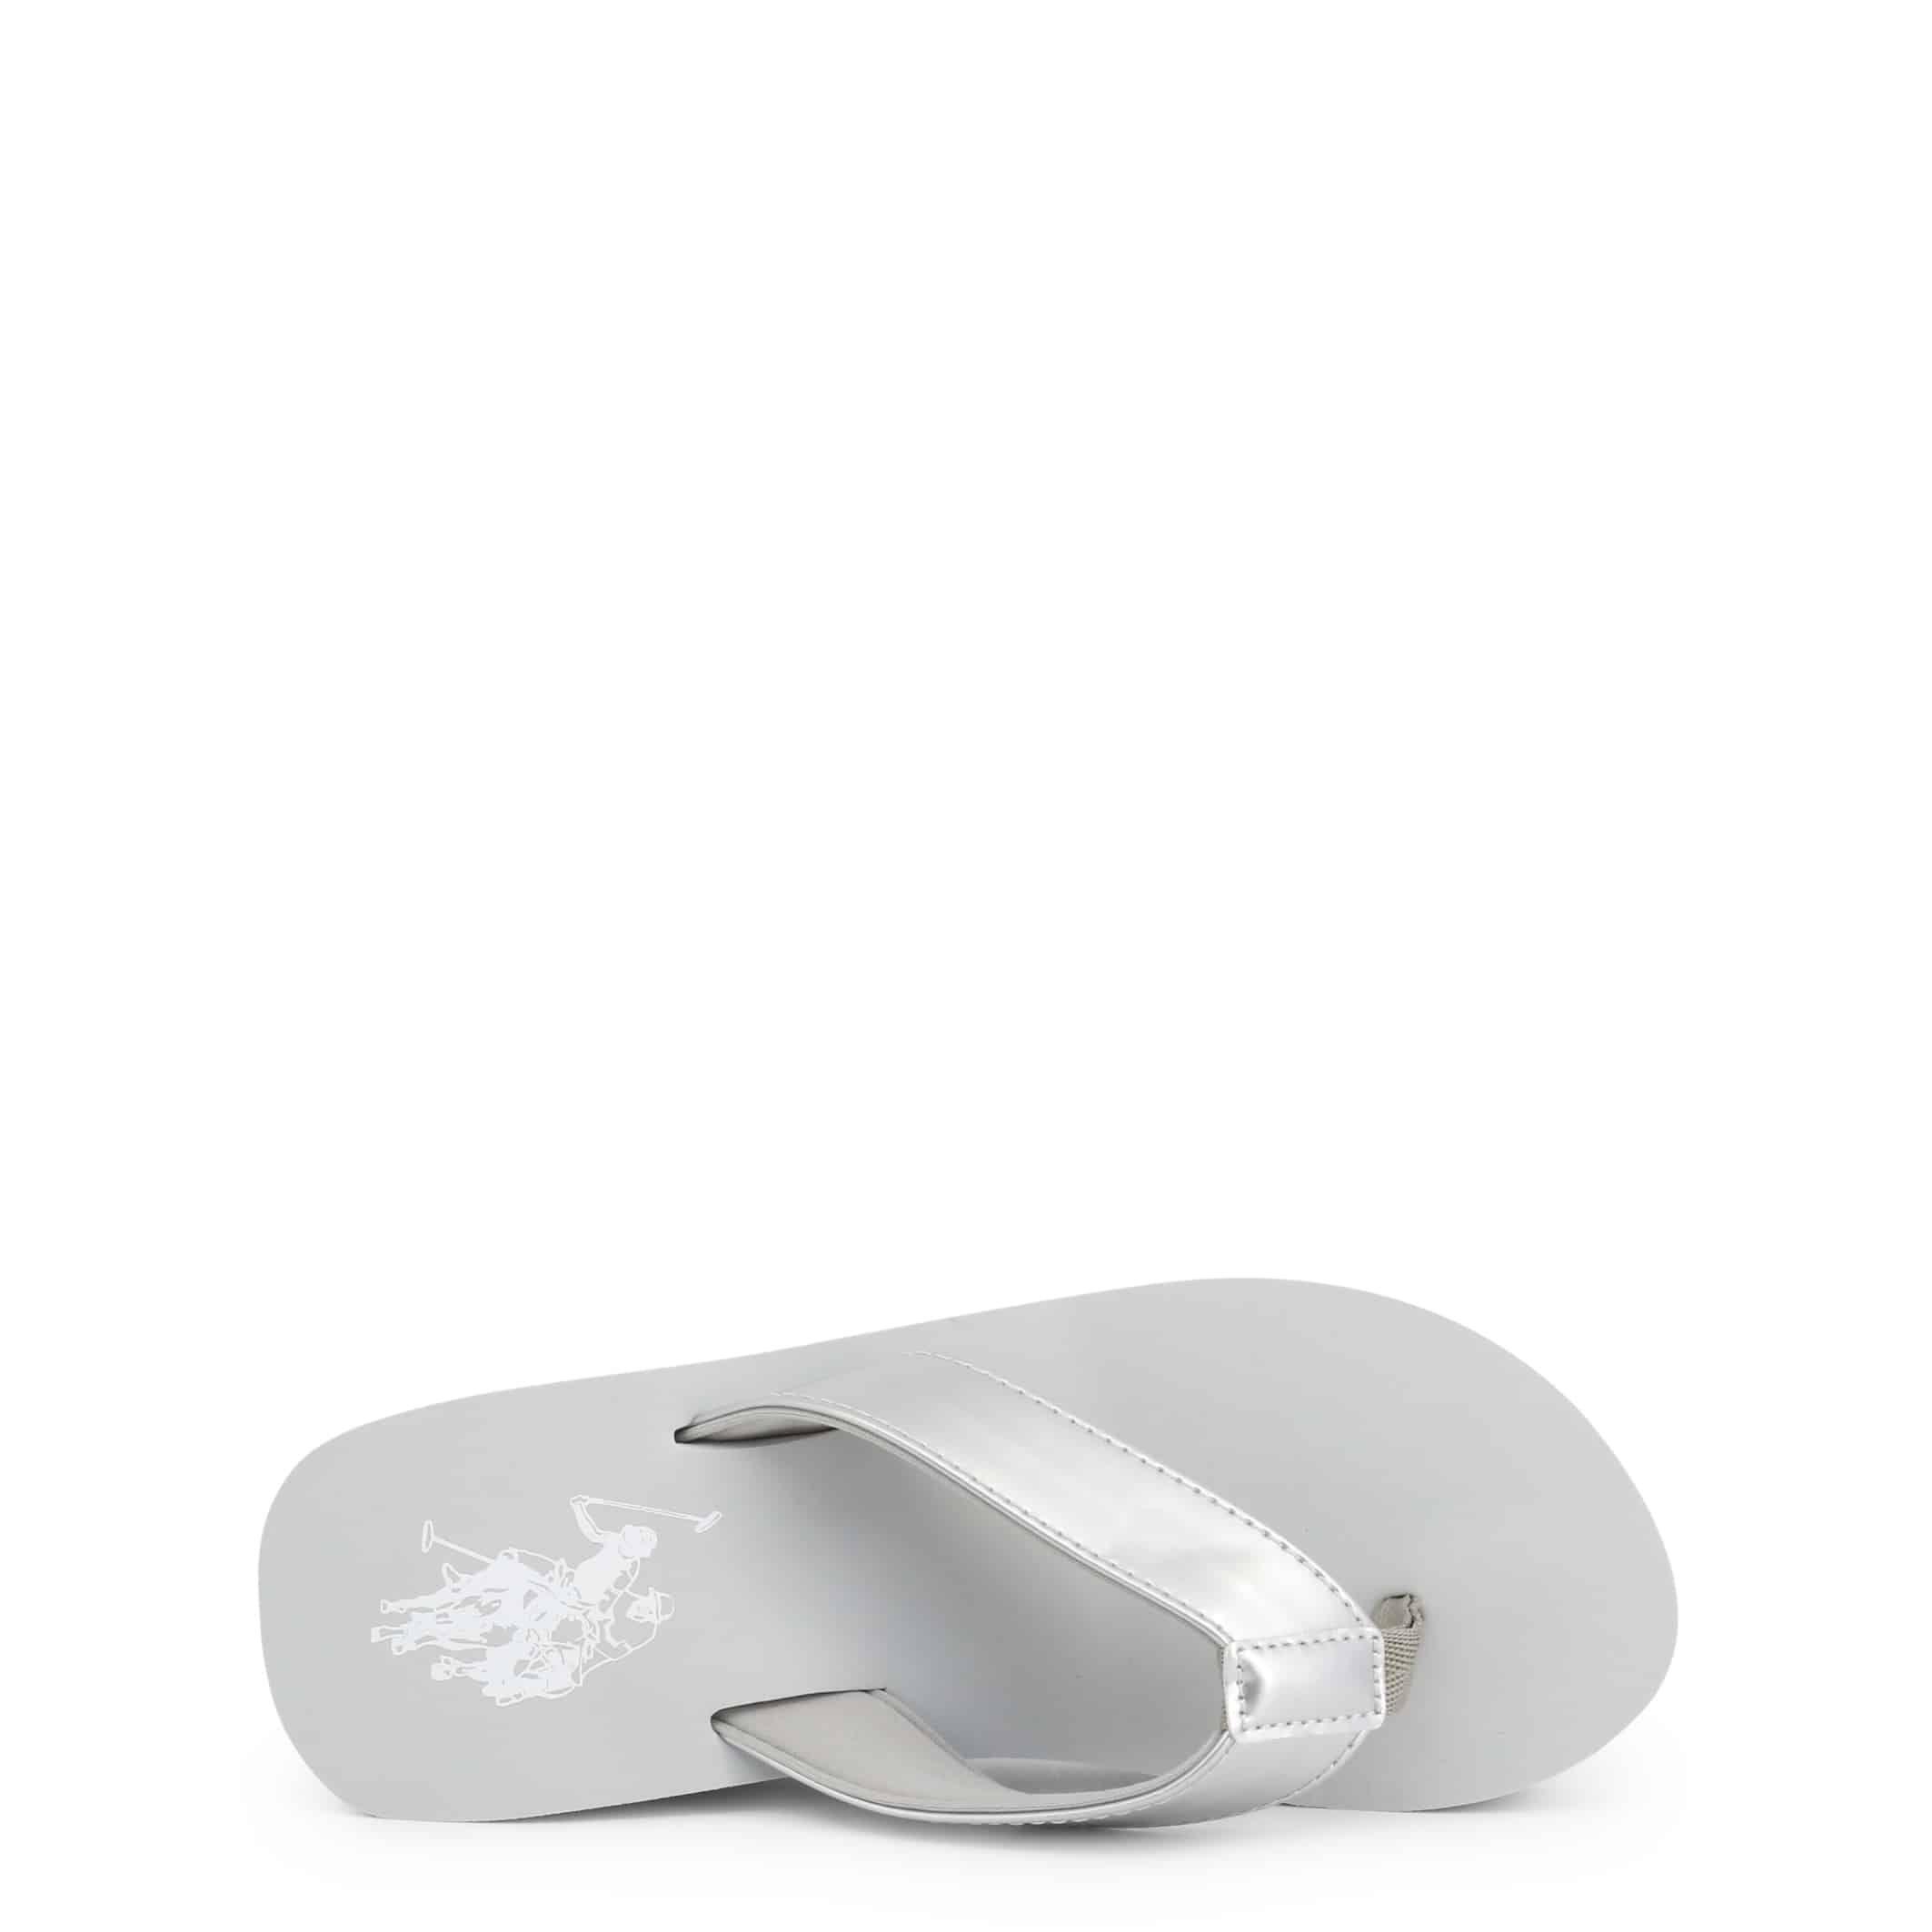 Flip Flops U.S. Polo Assn. – CHANY4093S0_Y1 – Grau